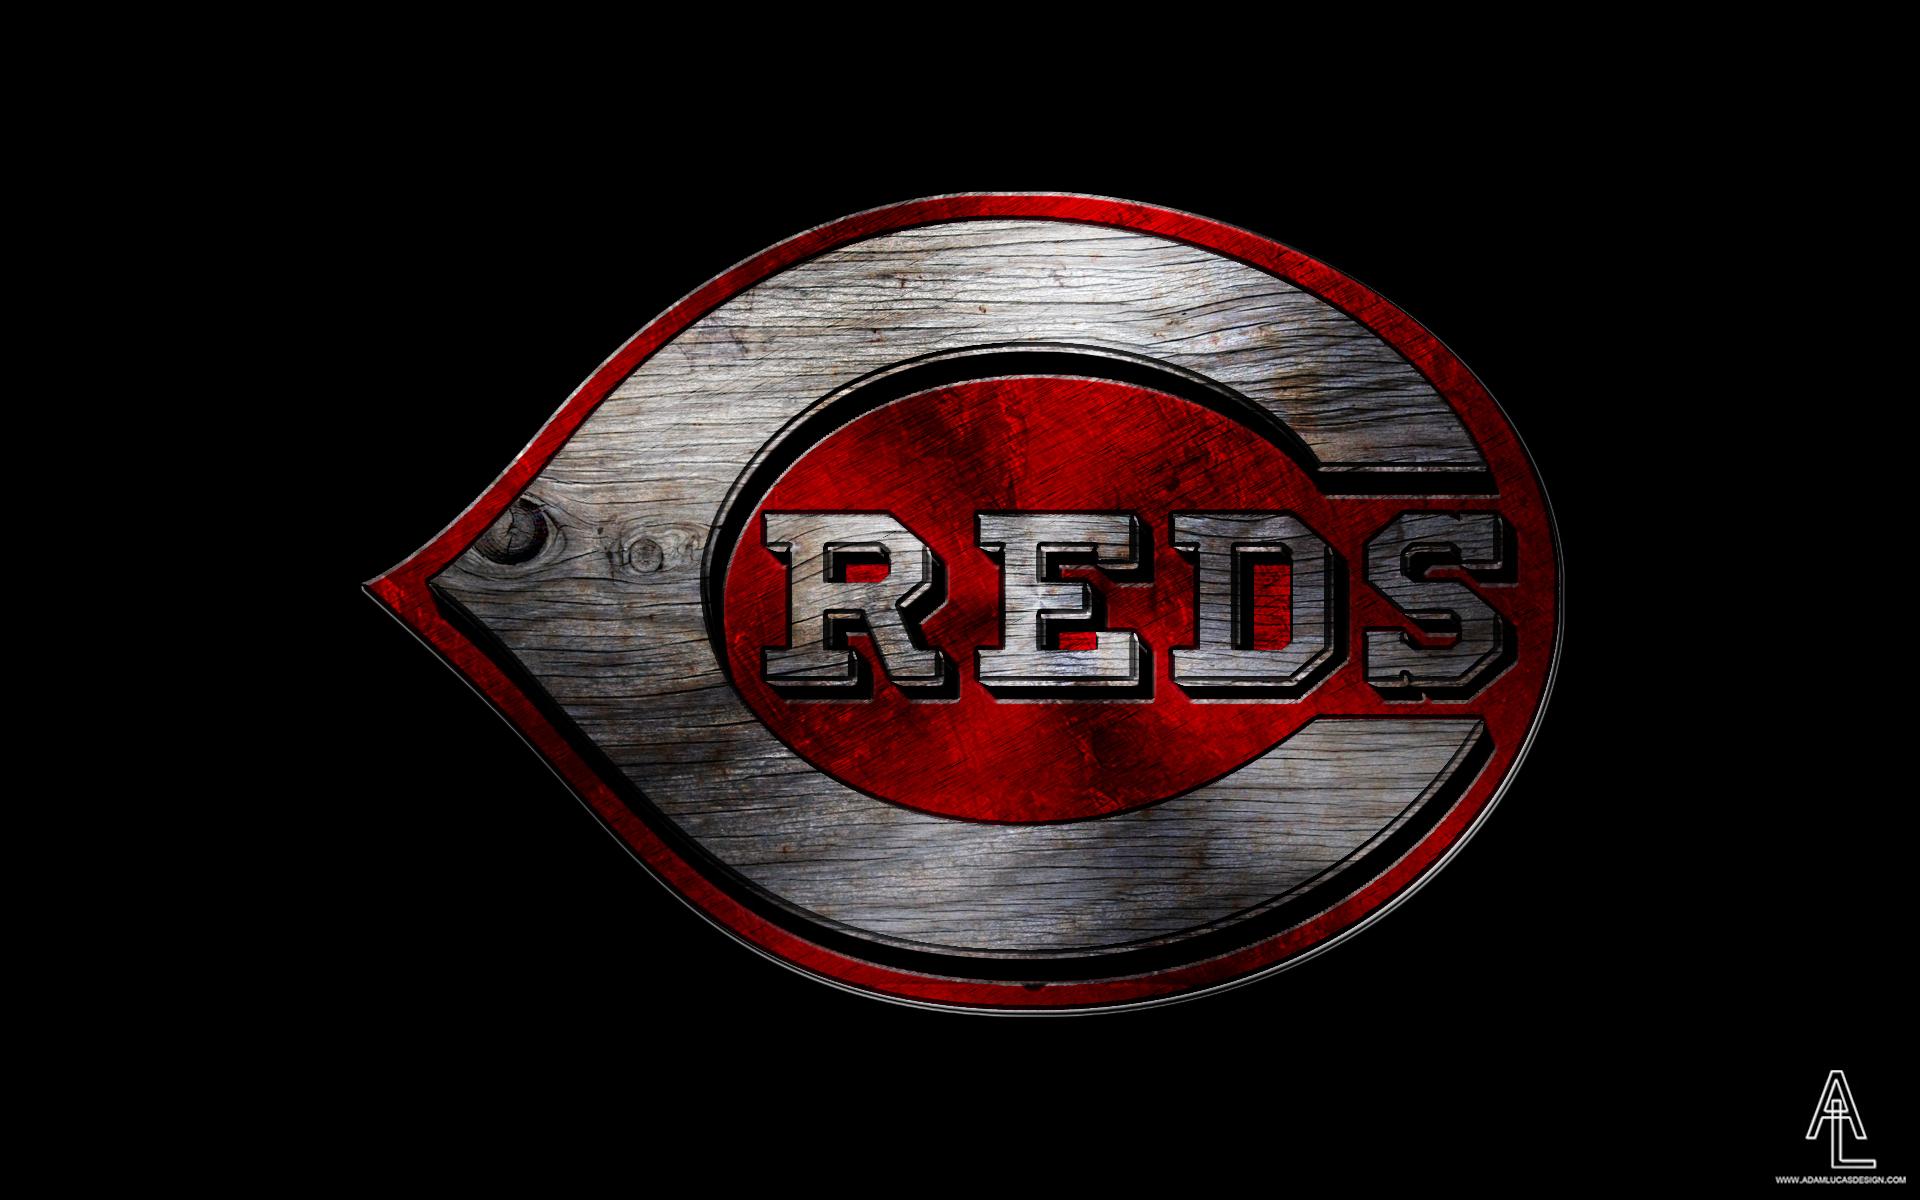 CINCINNATI REDS mlb baseball 27 wallpaper 1920x1200 229522 1920x1200